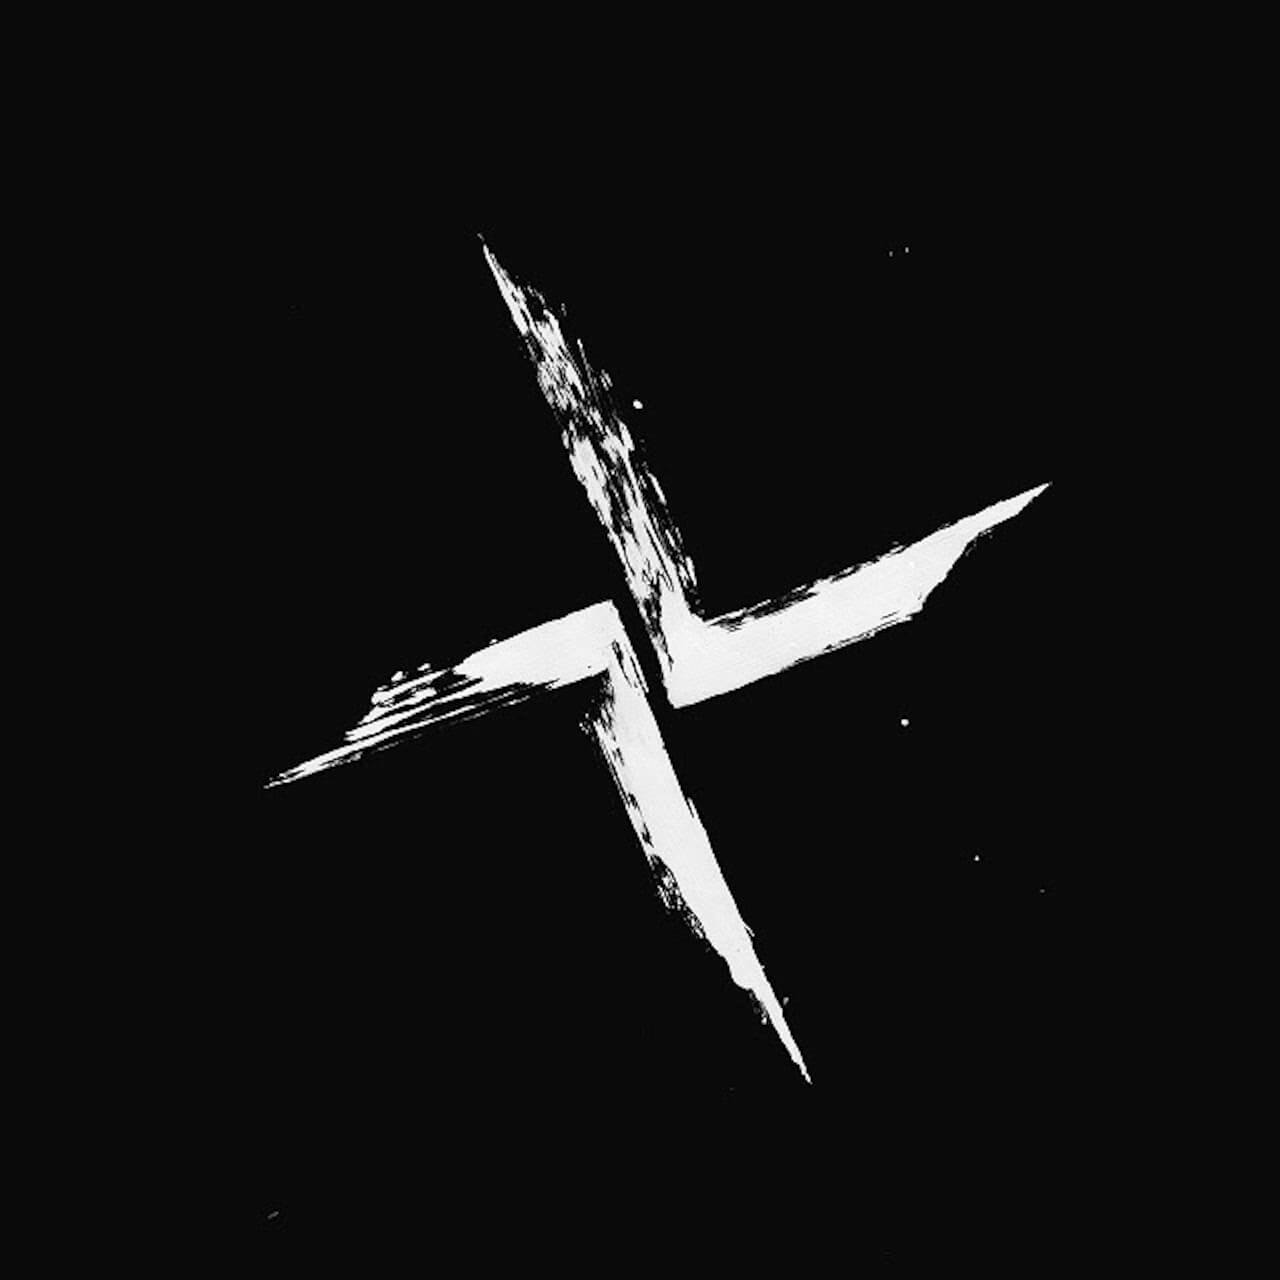 Burialの最新作「Tunes 2011-2019」が本日リリース|明日〈Hyperdub〉15周年のレーベルナイトが開催、Kode9らが出演 music191206-burial-hyperdub-3